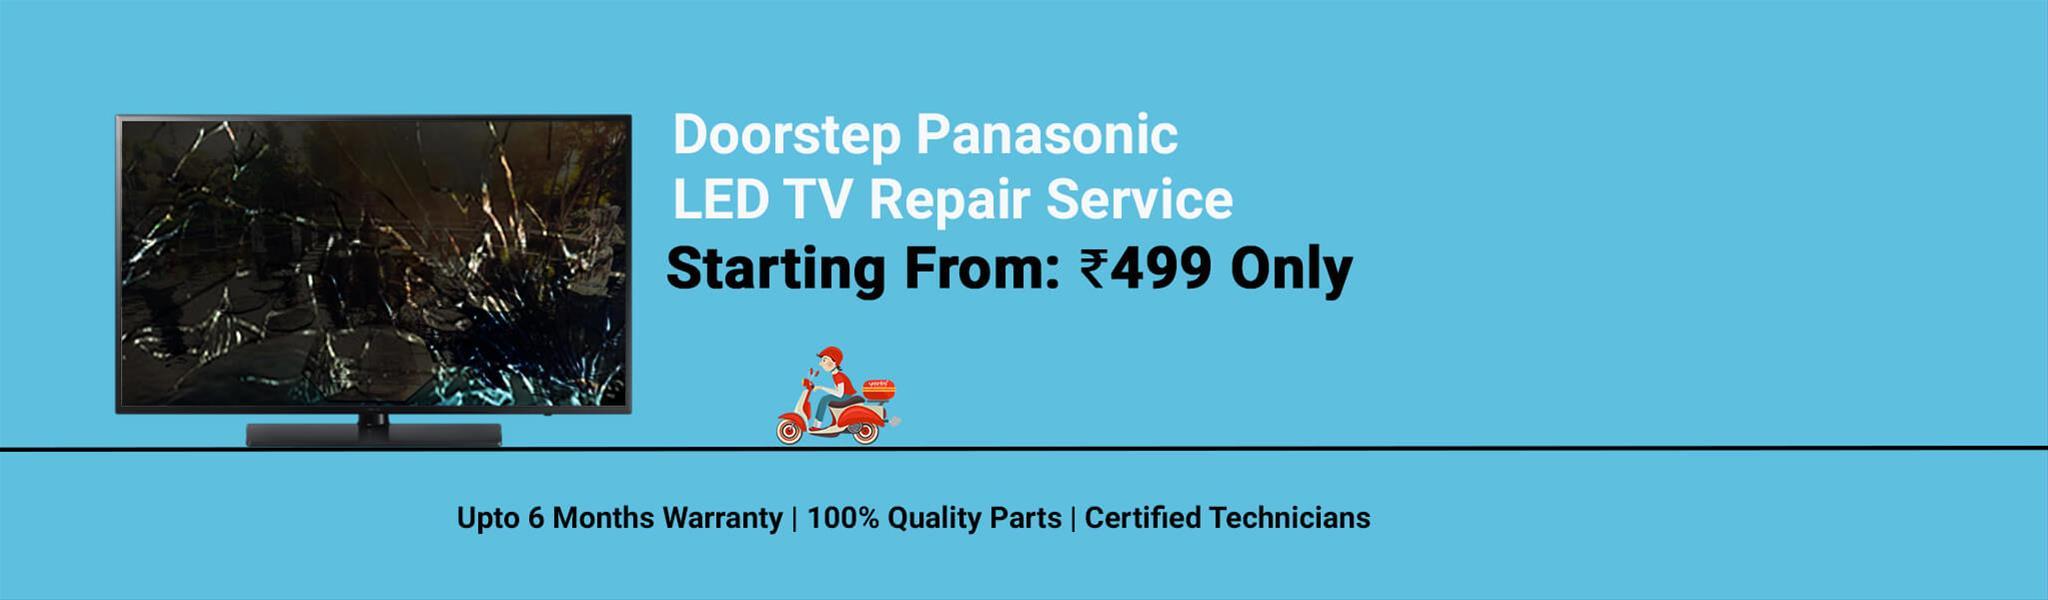 panasonic-led-tv-repair.jpg